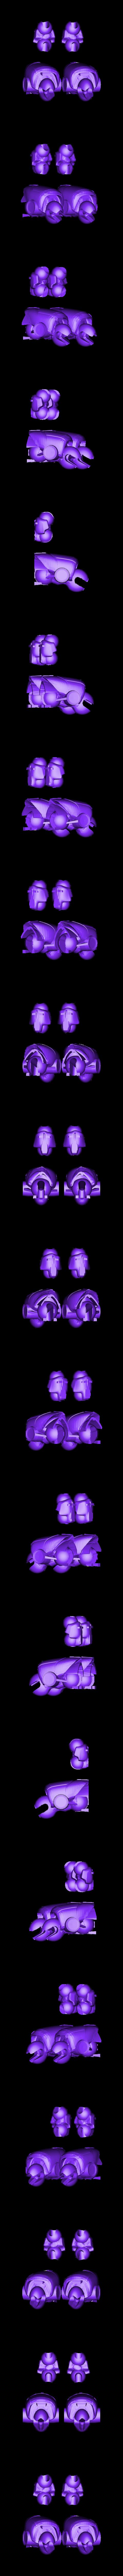 4_pieces_elbows_and_knees.stl Download free STL file Robot woman - Robotica • Model to 3D print, Shira